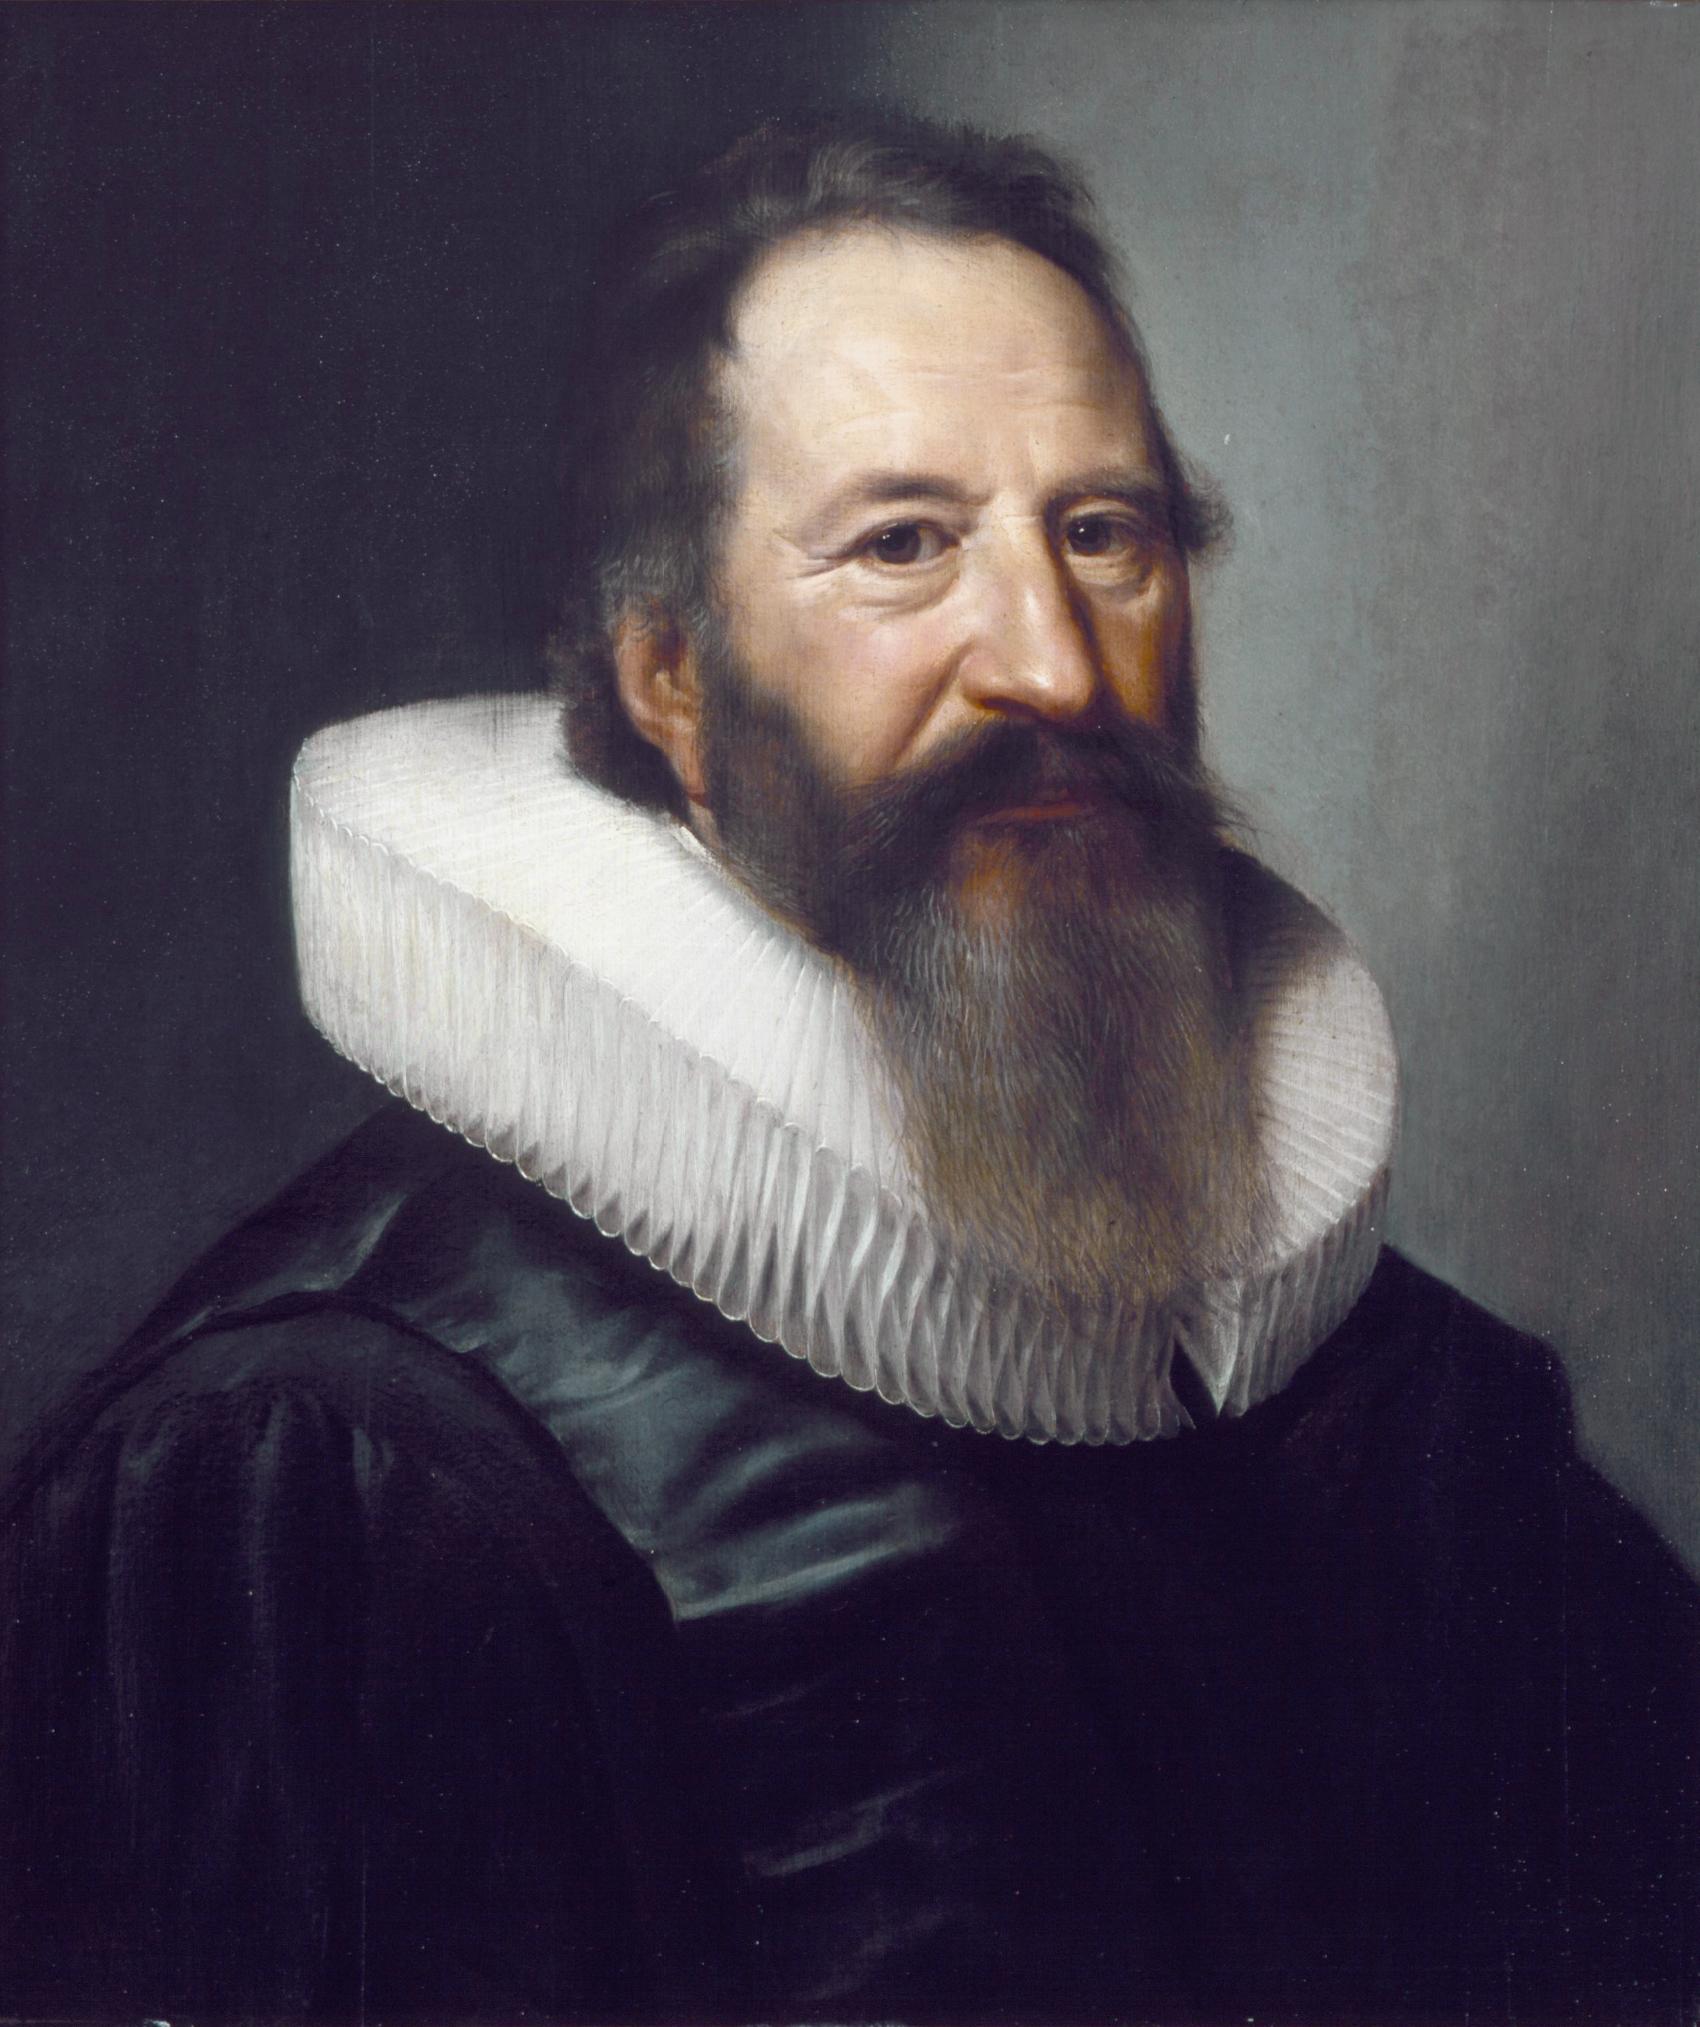 Gerrit Johan Vossius